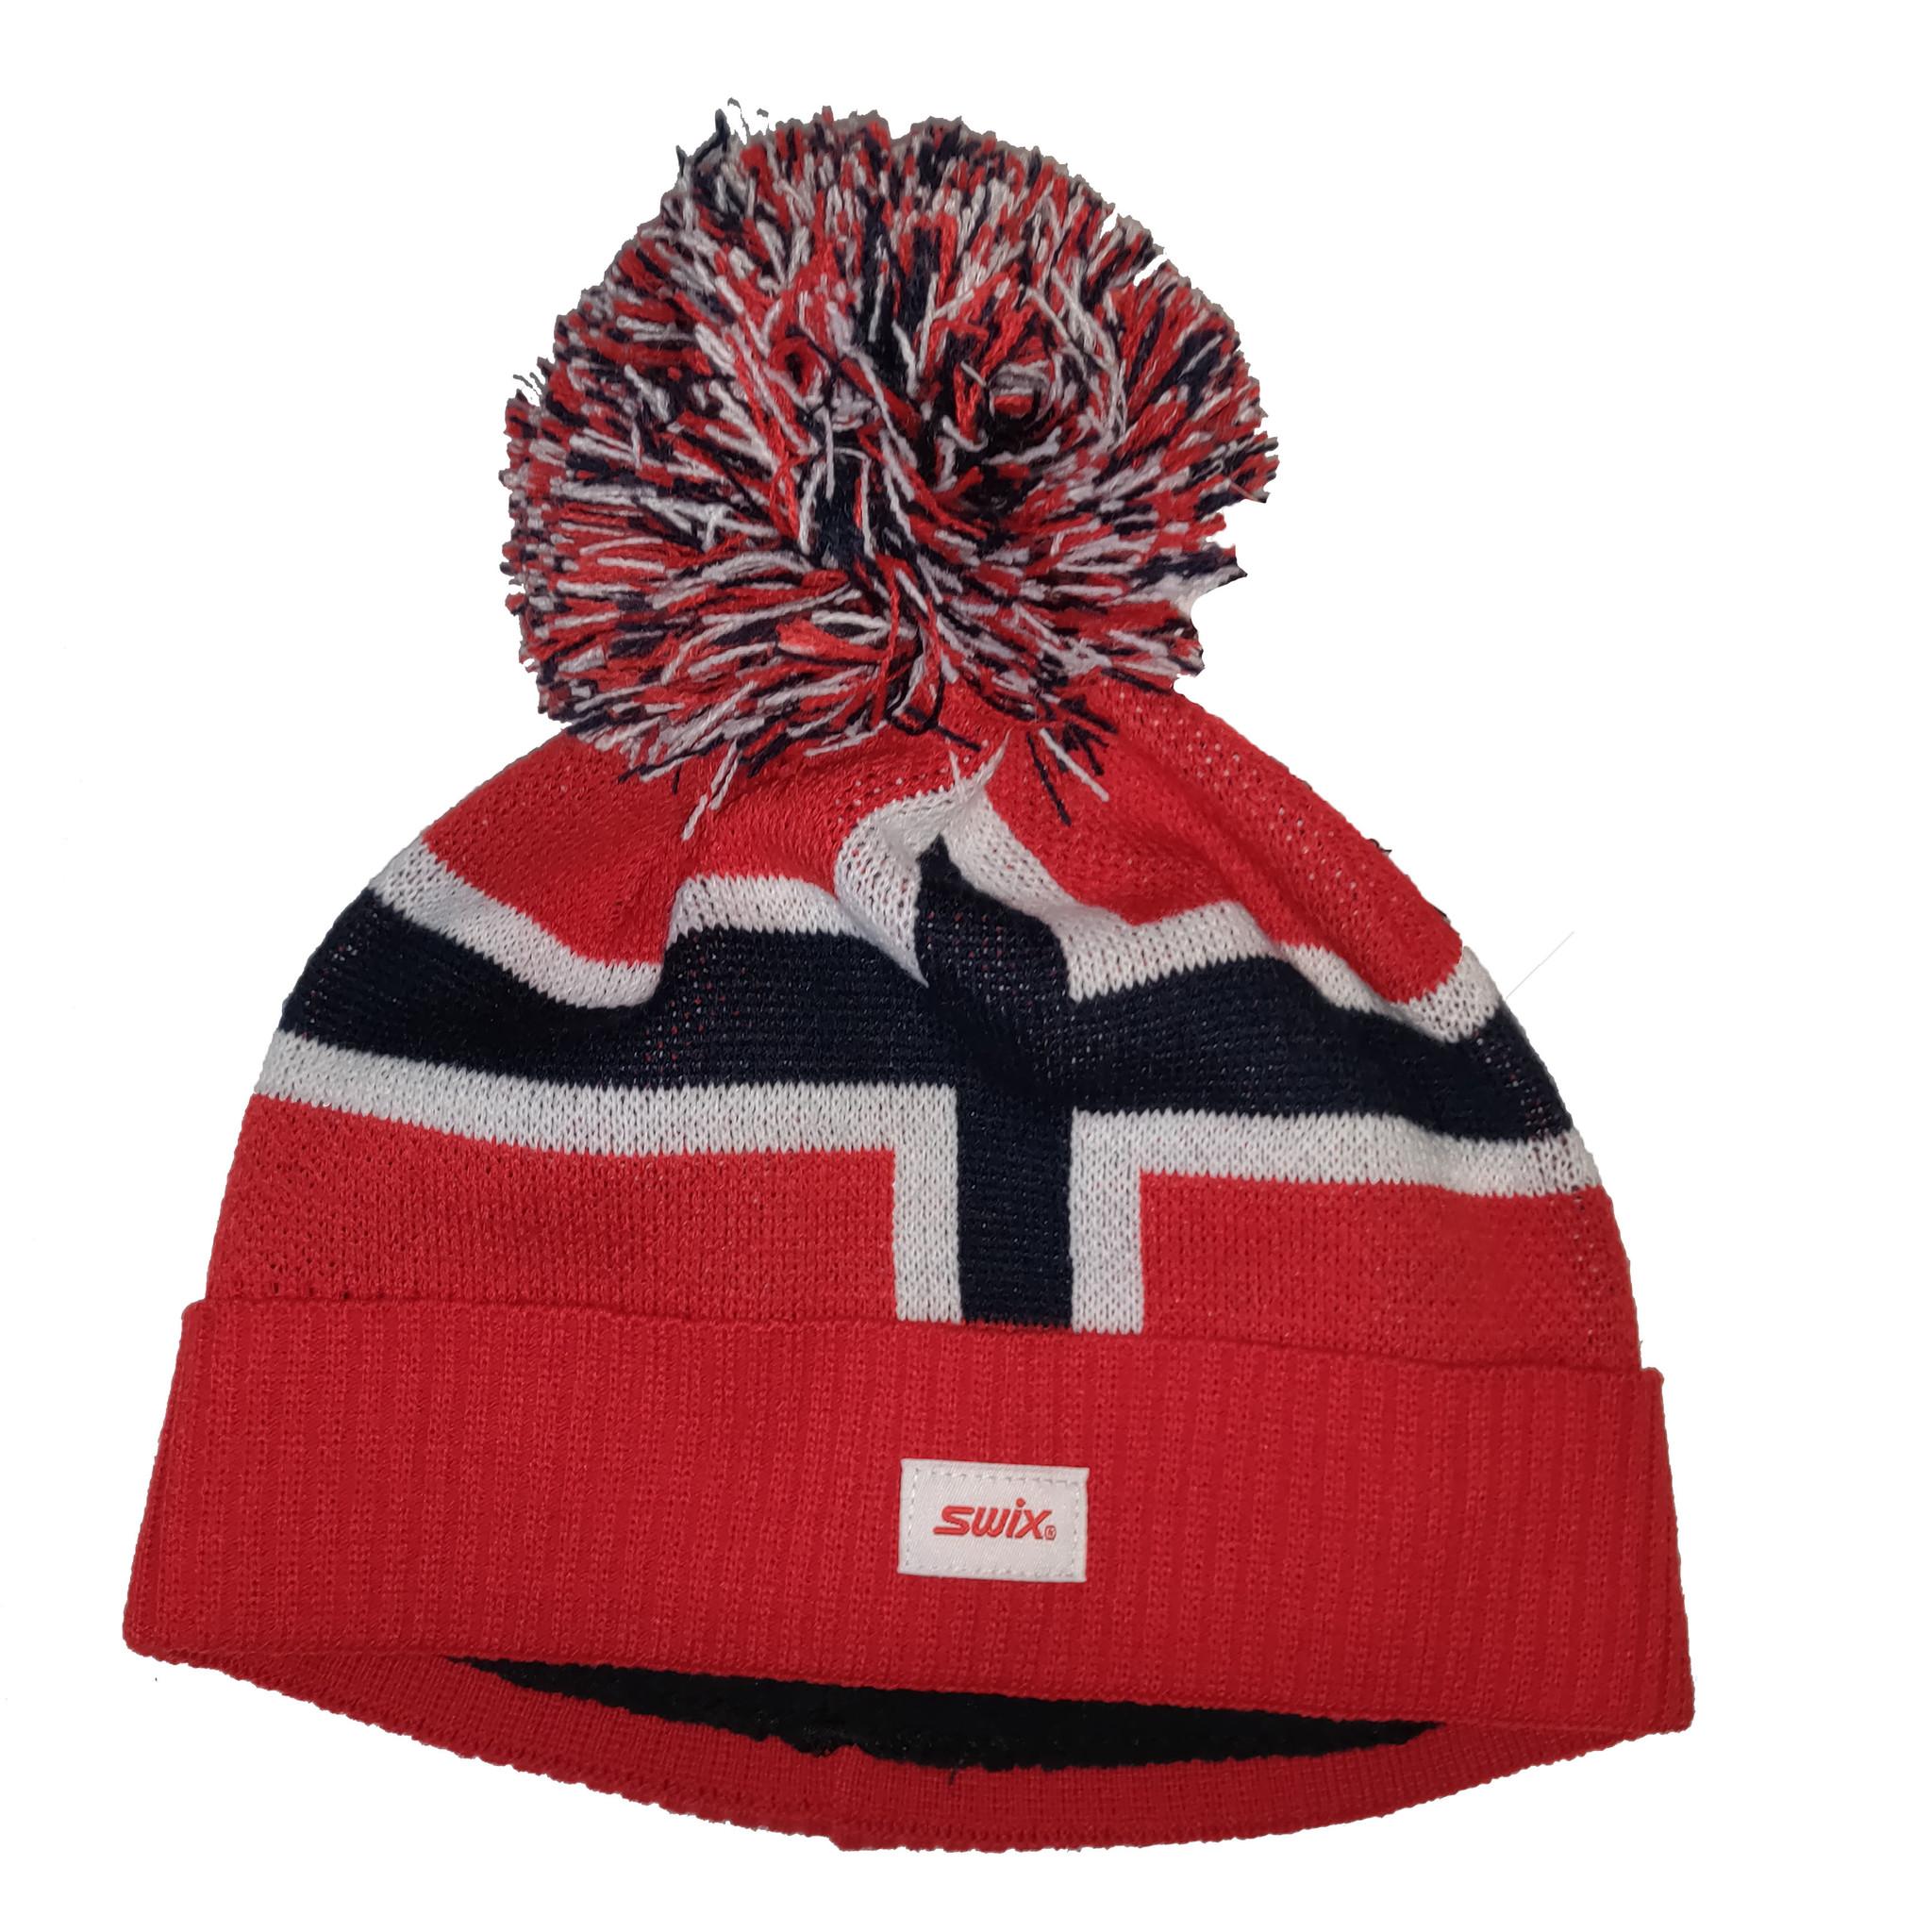 Swix Swix Norway Big Pom Hat